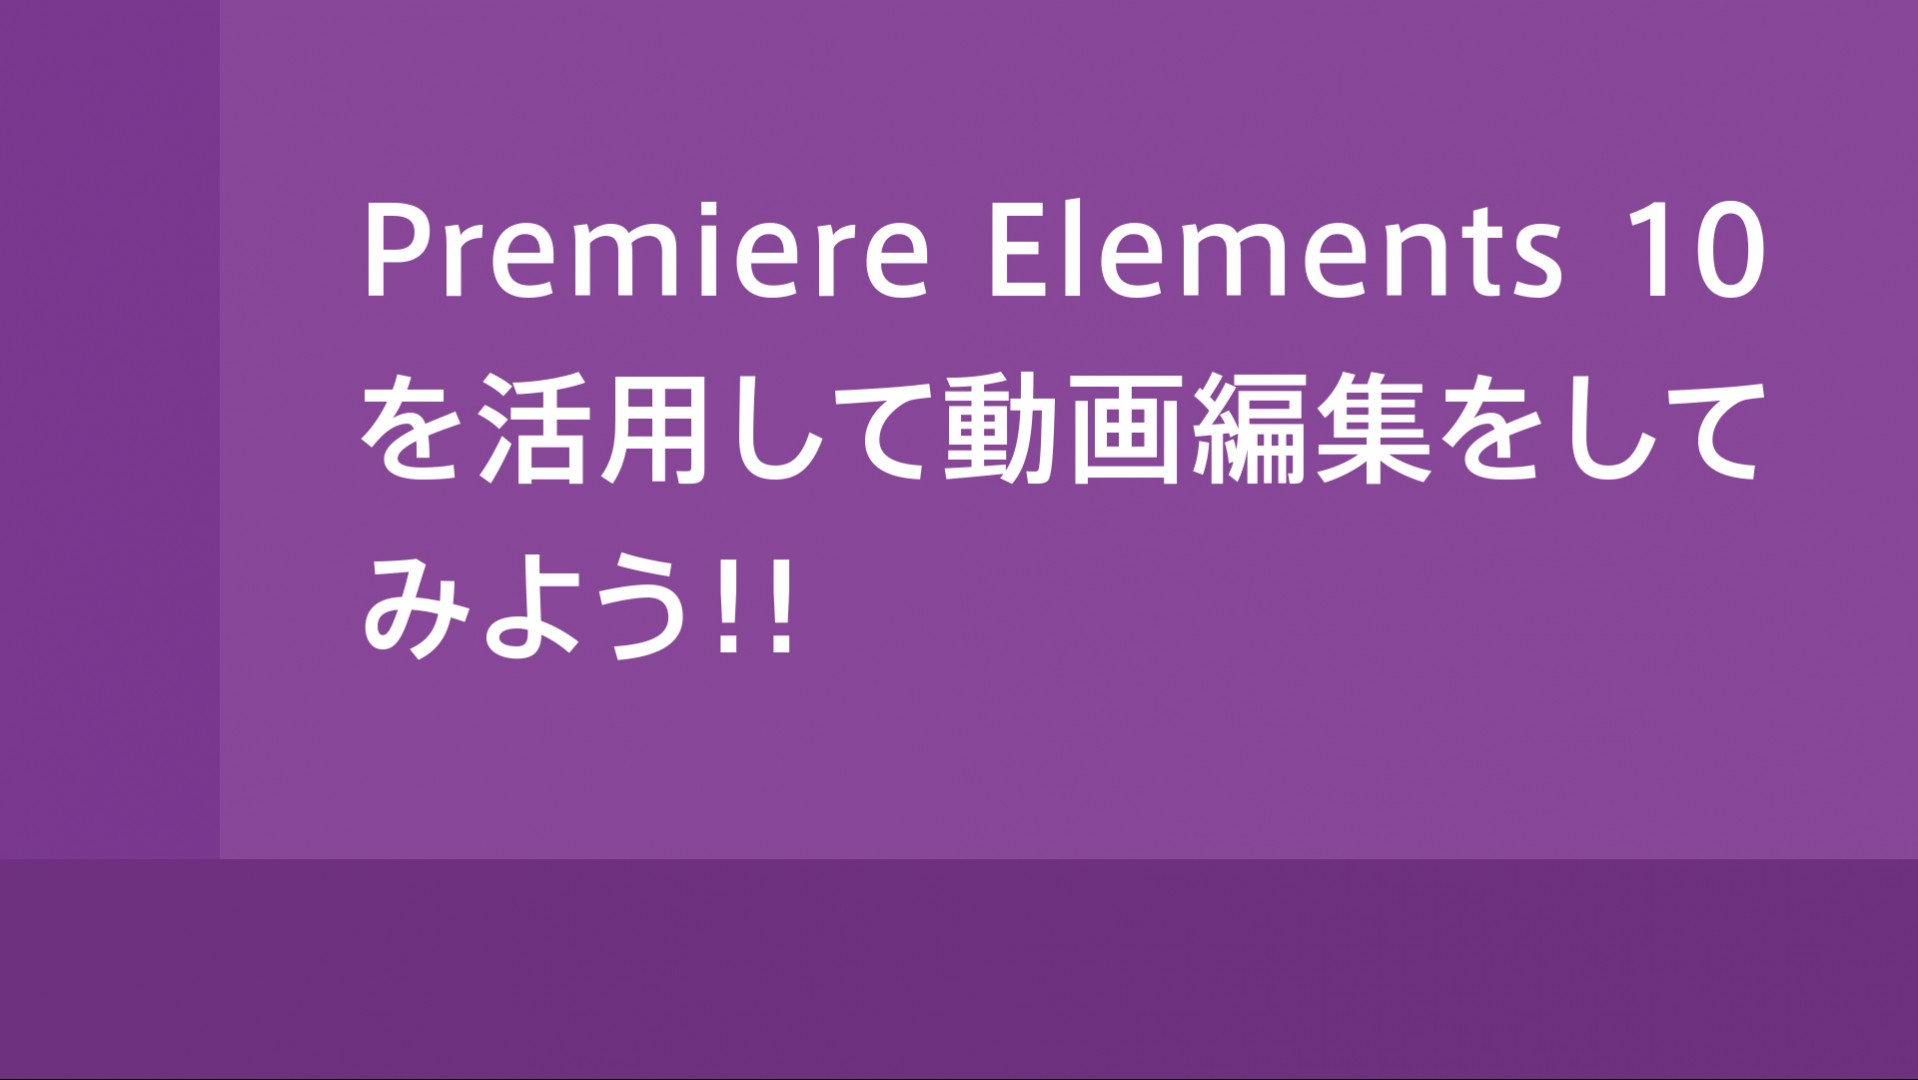 Premiere Elements 10 webカメラから撮影する